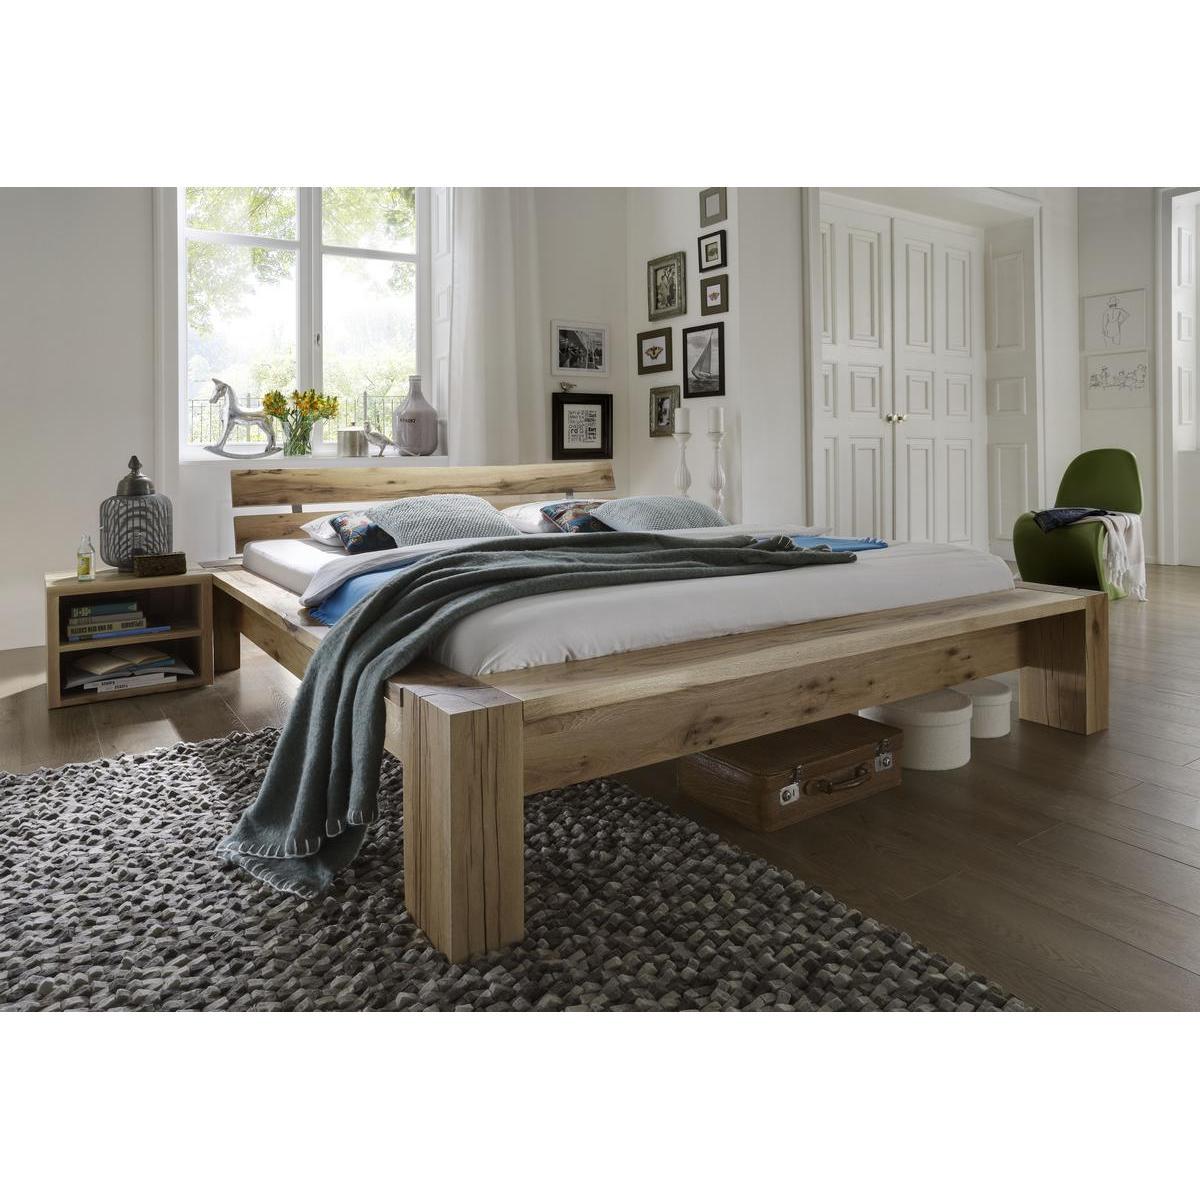 echtholz balkenbett 160x200 heavy sleep capri wildeiche. Black Bedroom Furniture Sets. Home Design Ideas